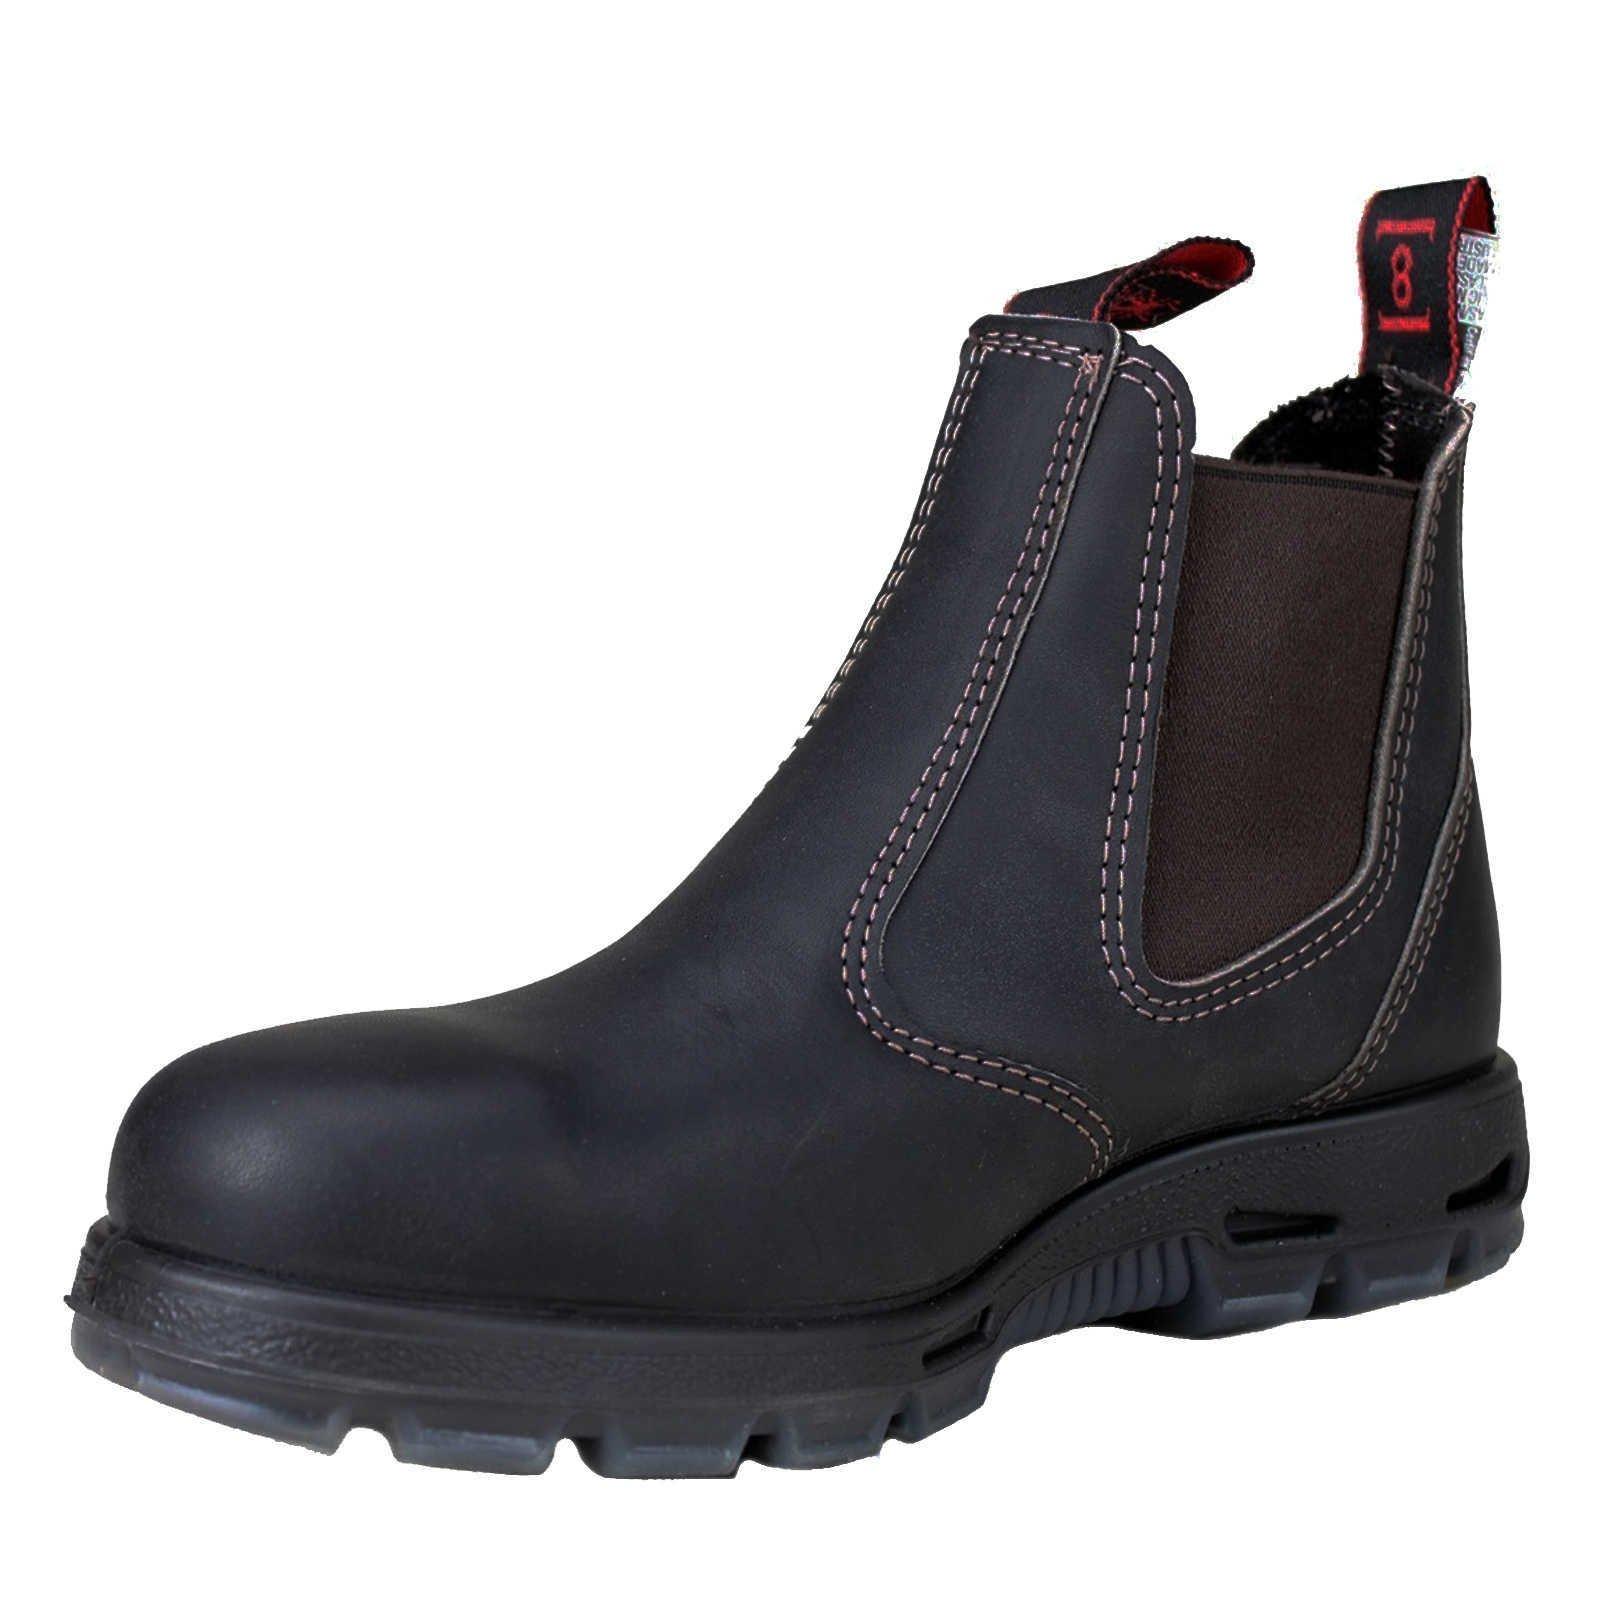 RedbacK Men's Safety Bobcat USBOK Elastic Sided Steel Toe Dark Brown Leather Work Boot (9.5 AU 3E (10.5 M US Men)) by RedbacK